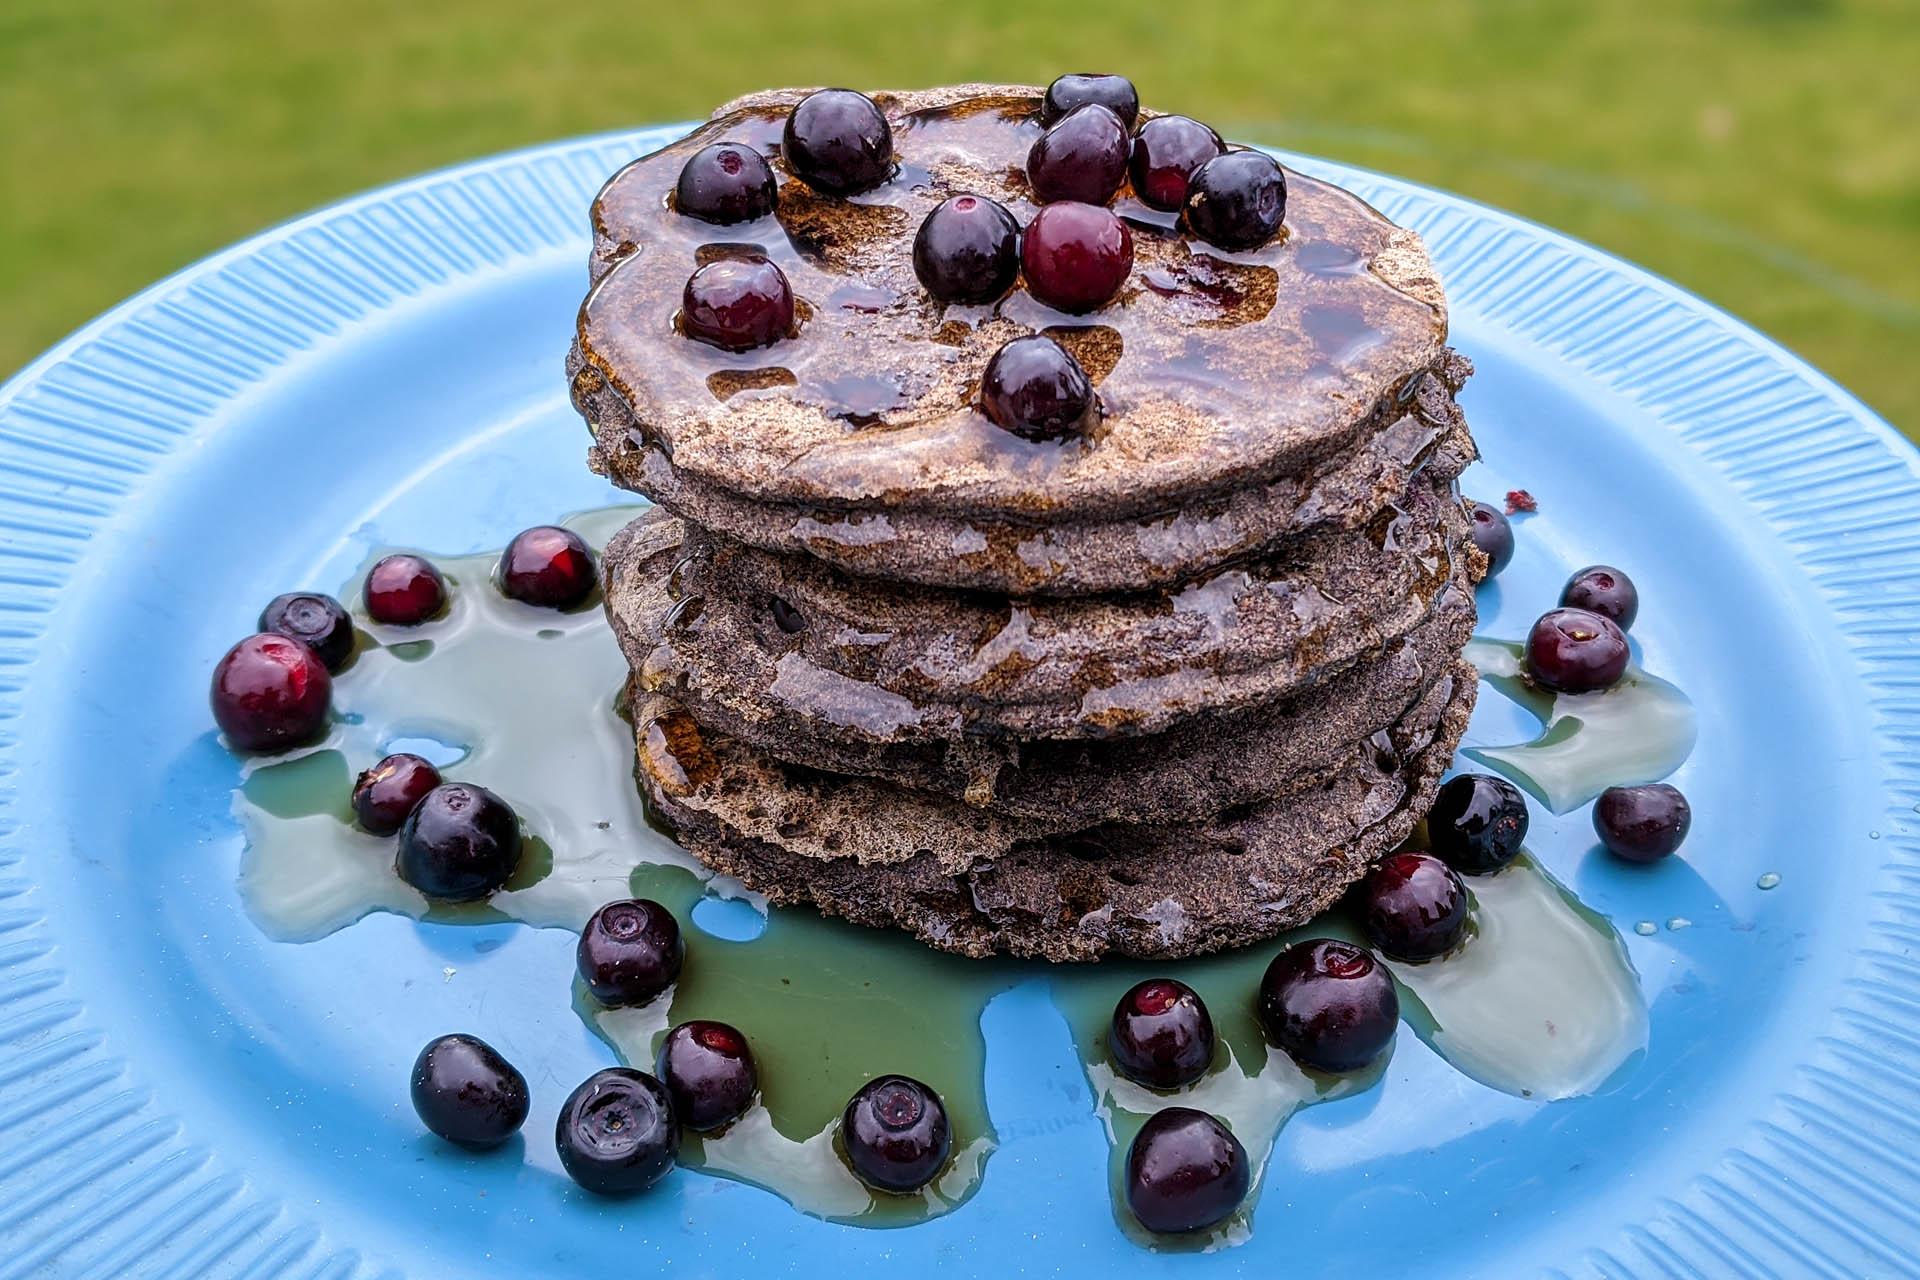 Huckleberry pancakes